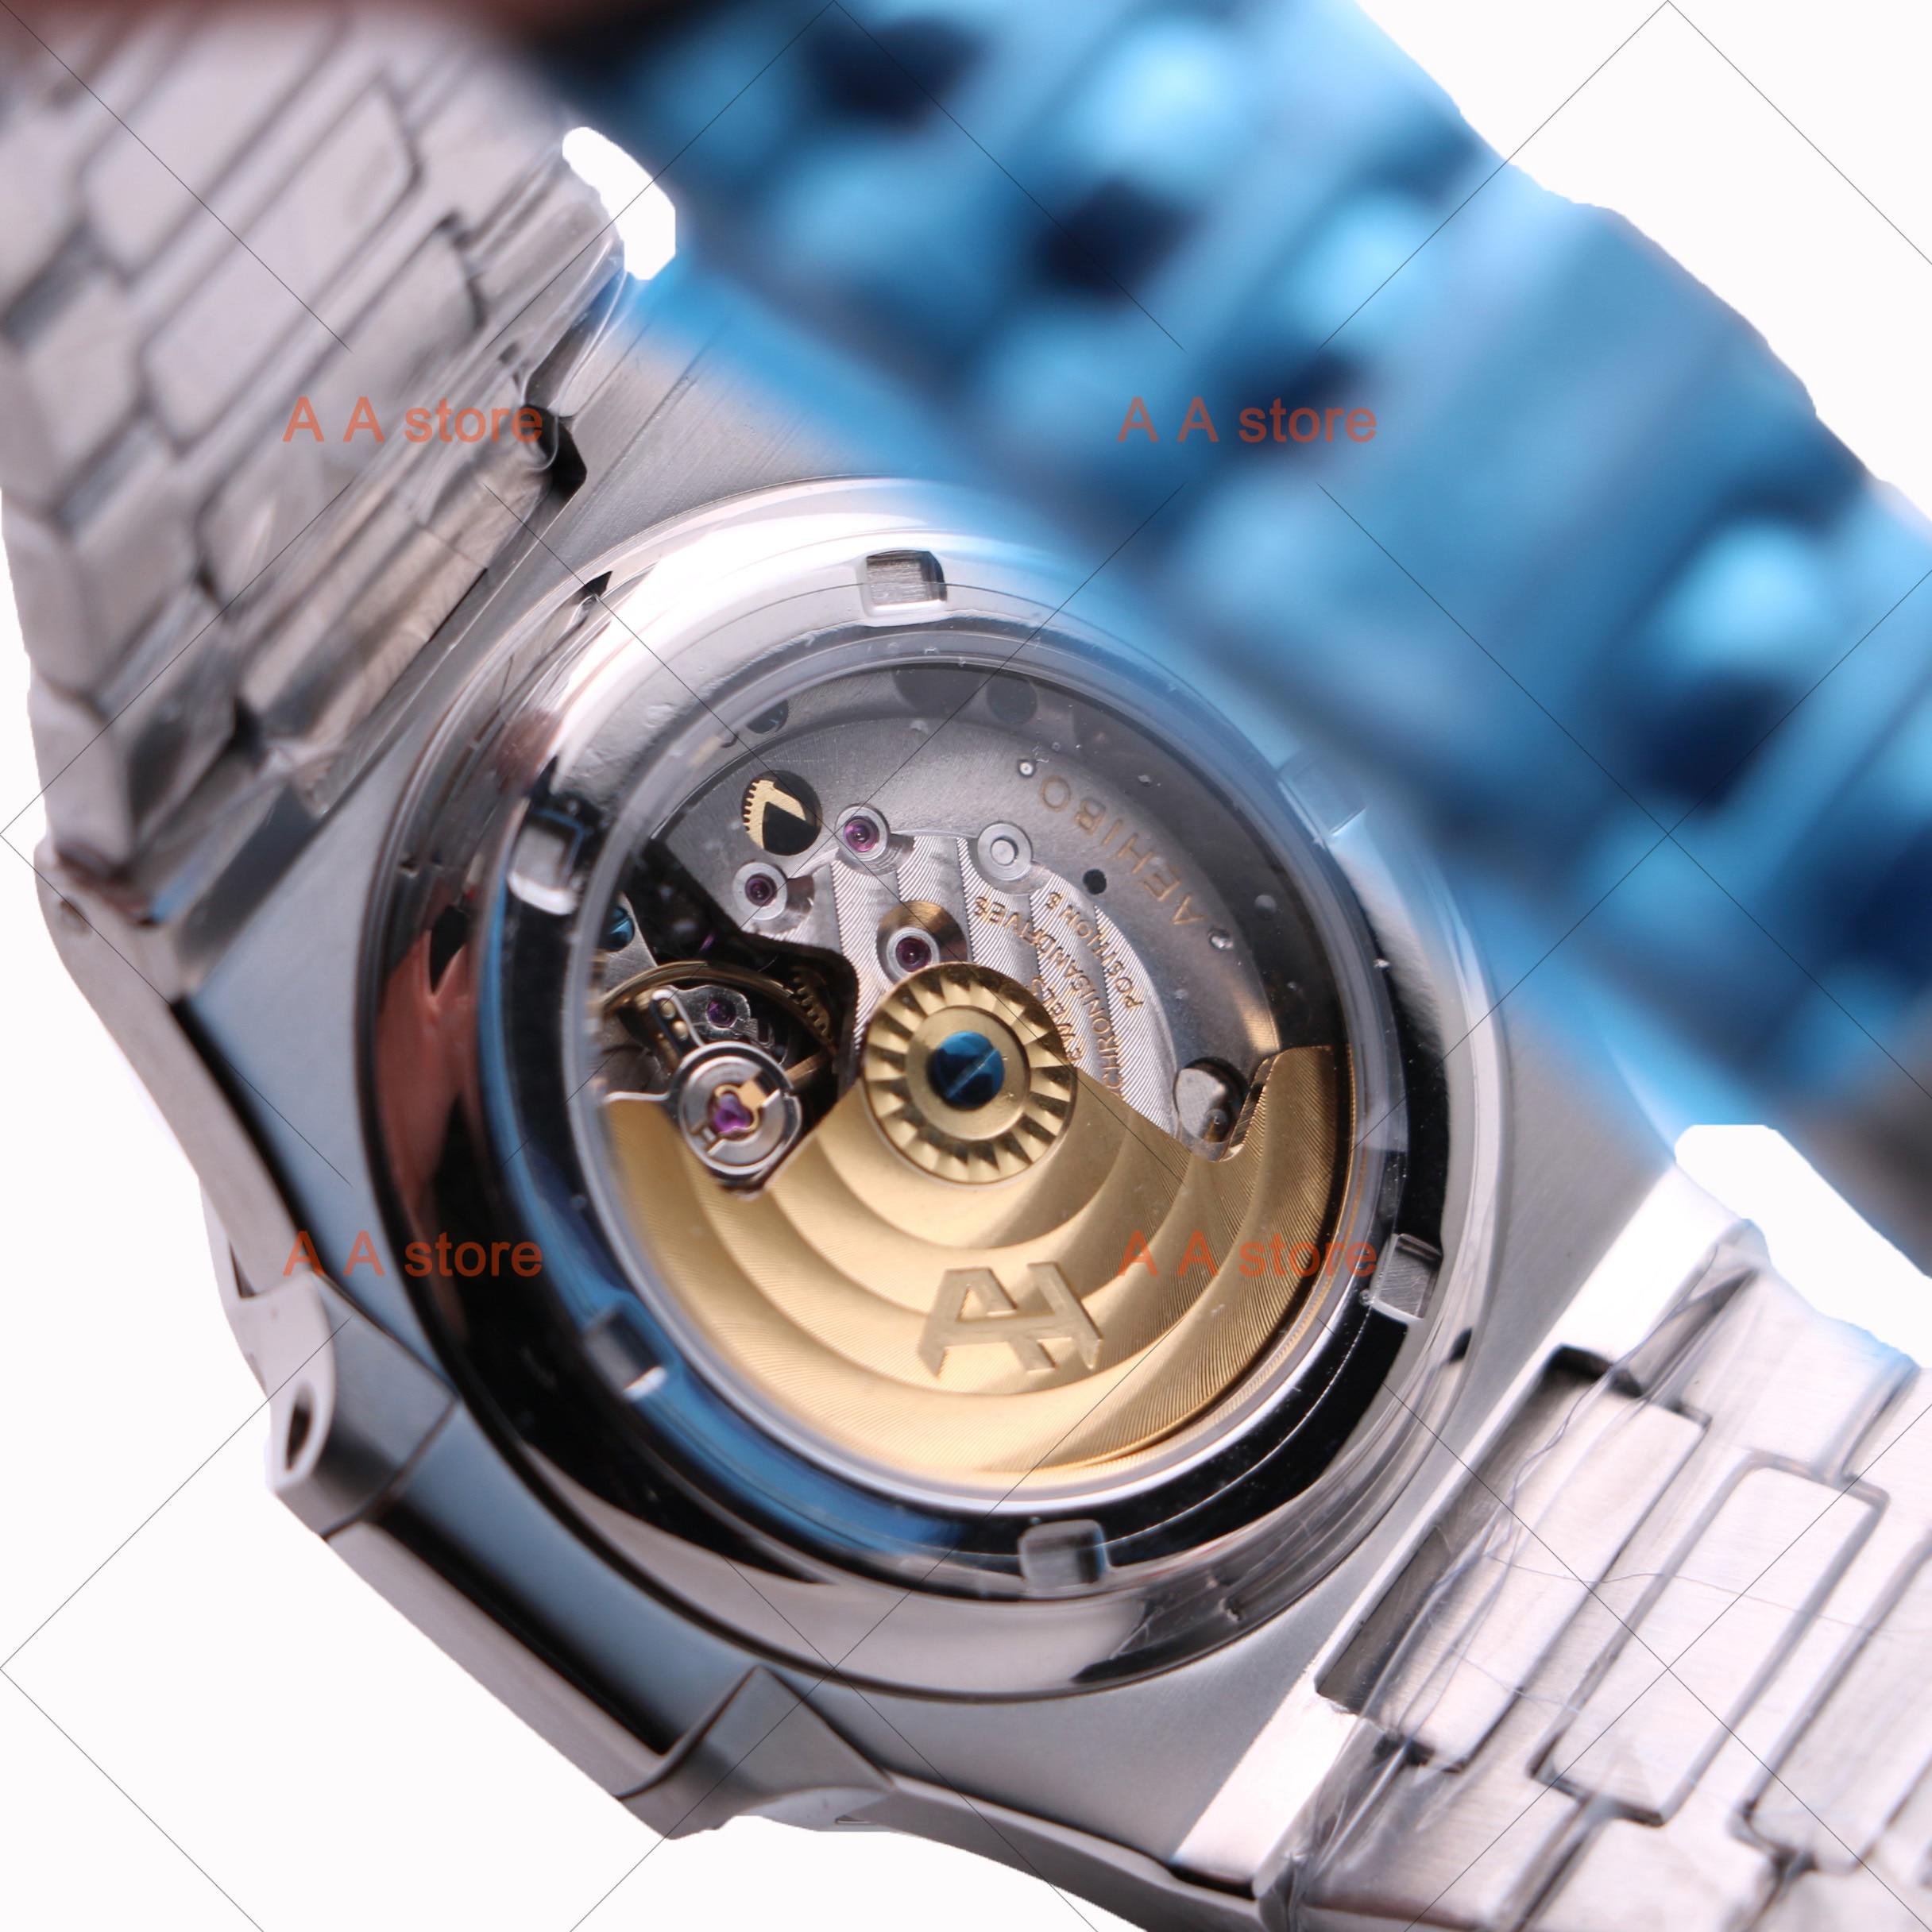 Zegarek AAA luksusowej marki zegarek geneva 5711 PP zegarek męski ruch miyota szafirowe szkło darmowa wysyłka